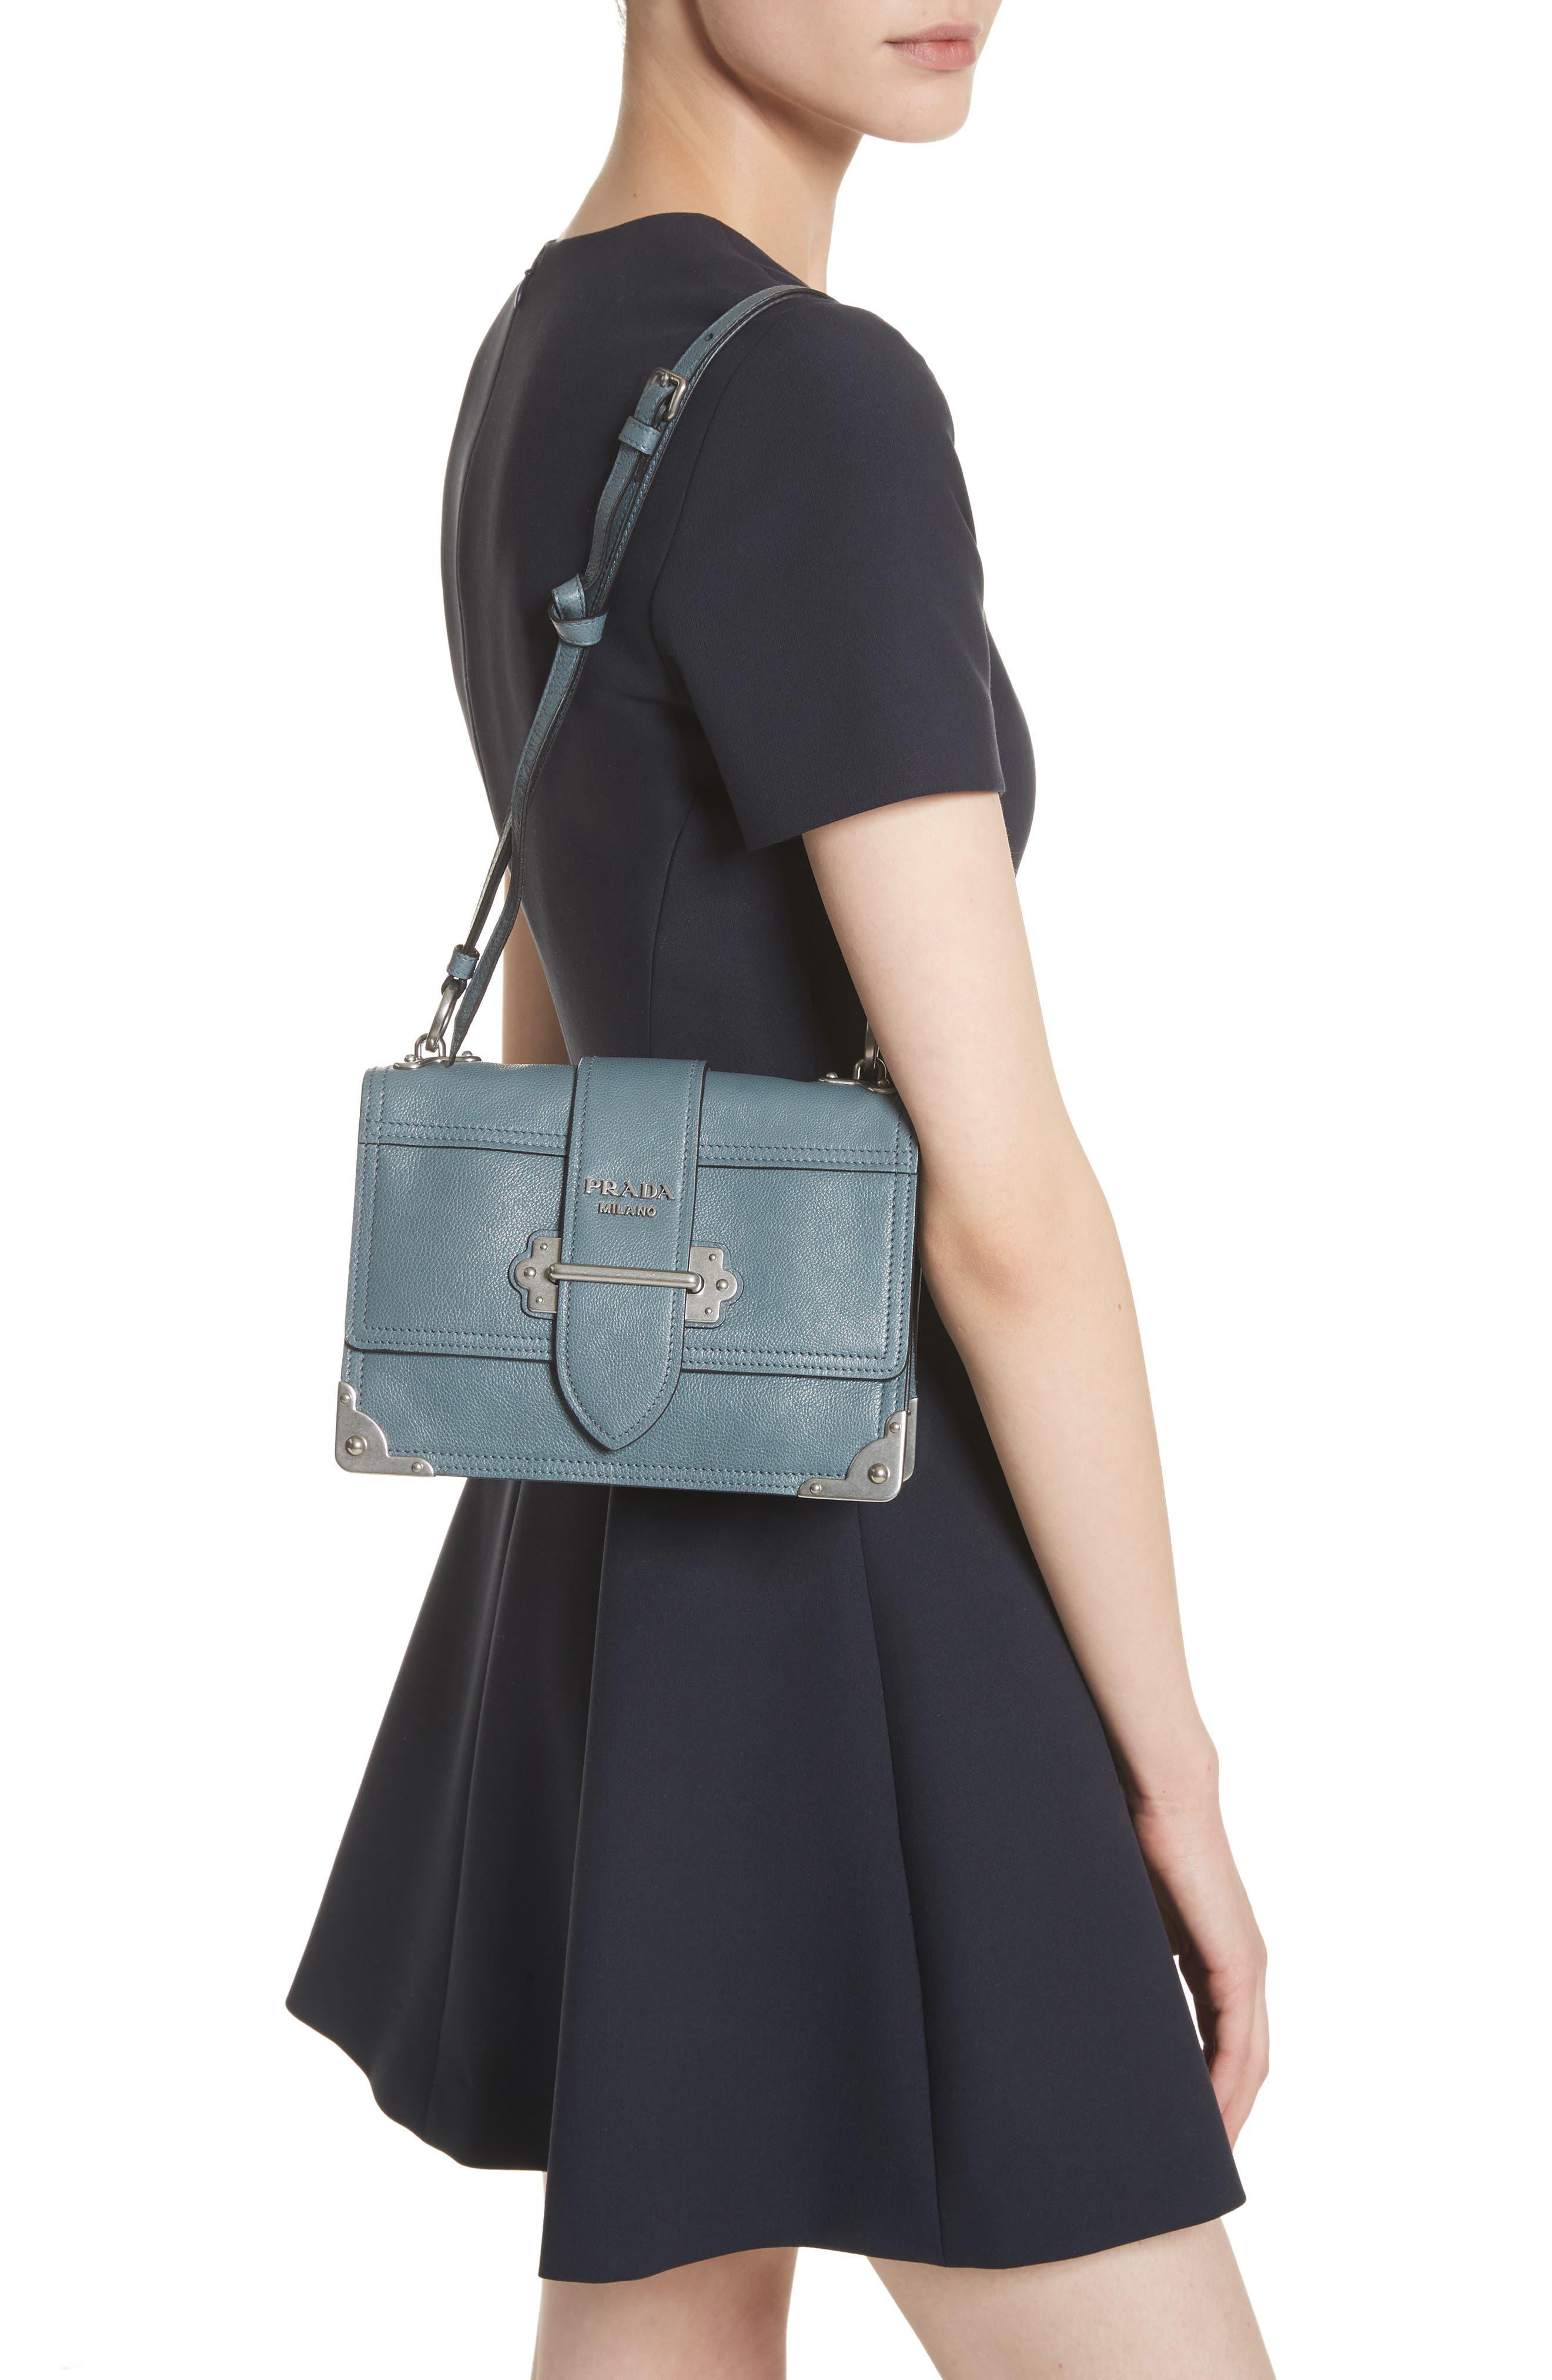 Cahier Glace Calfskin Convertible Shoulder Bag,                             Alternate thumbnail 2, color,                             MARINE/ ASTRALE 1